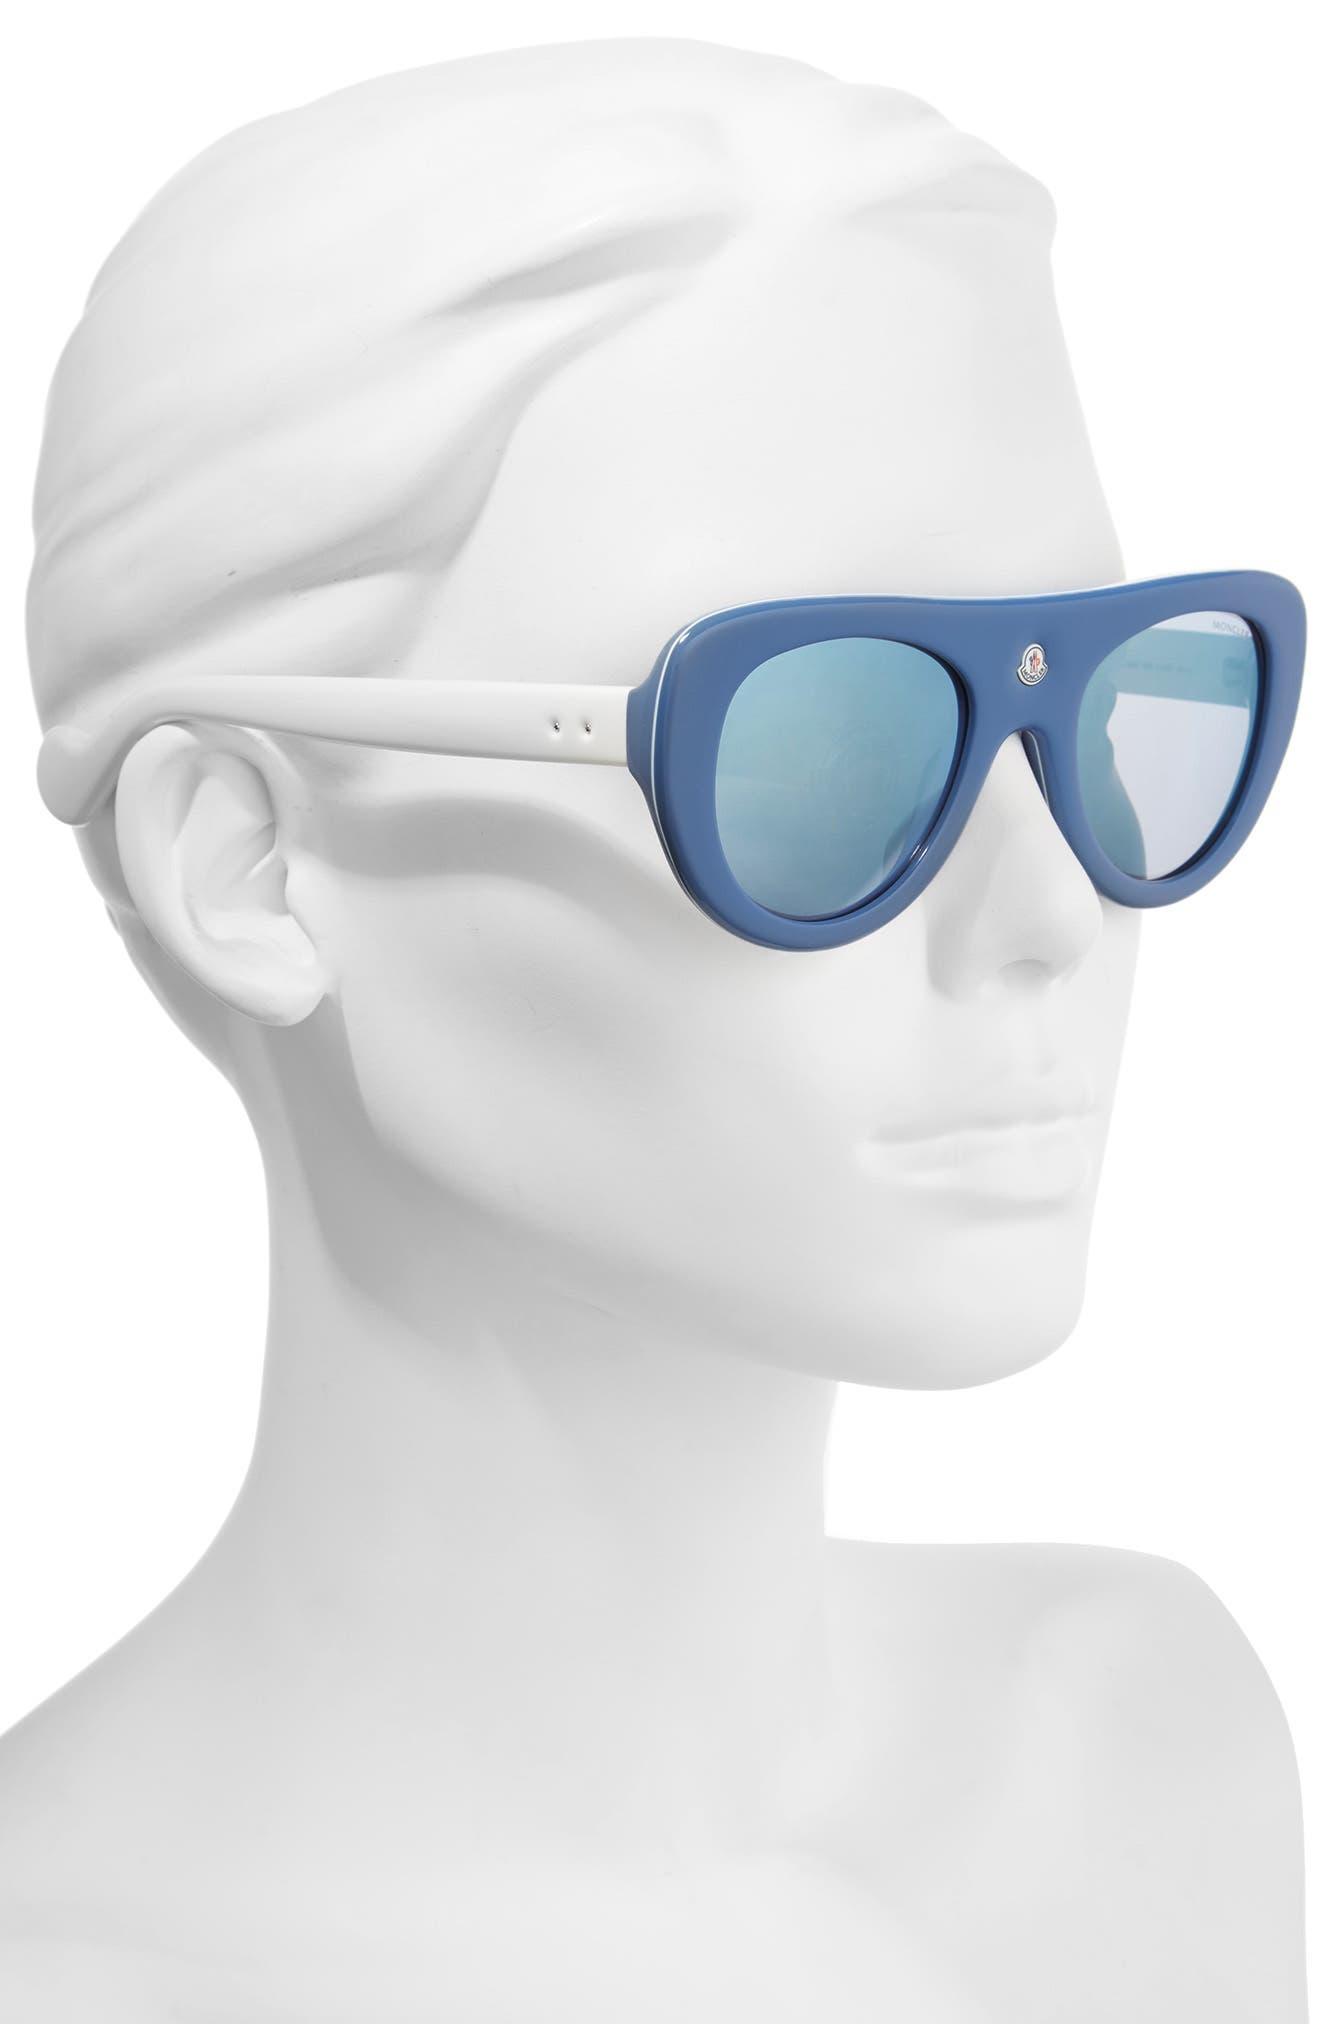 51mm Shield Sunglasses,                             Alternate thumbnail 2, color,                             BLUE/ IVORY/ VIOLET MIRROR